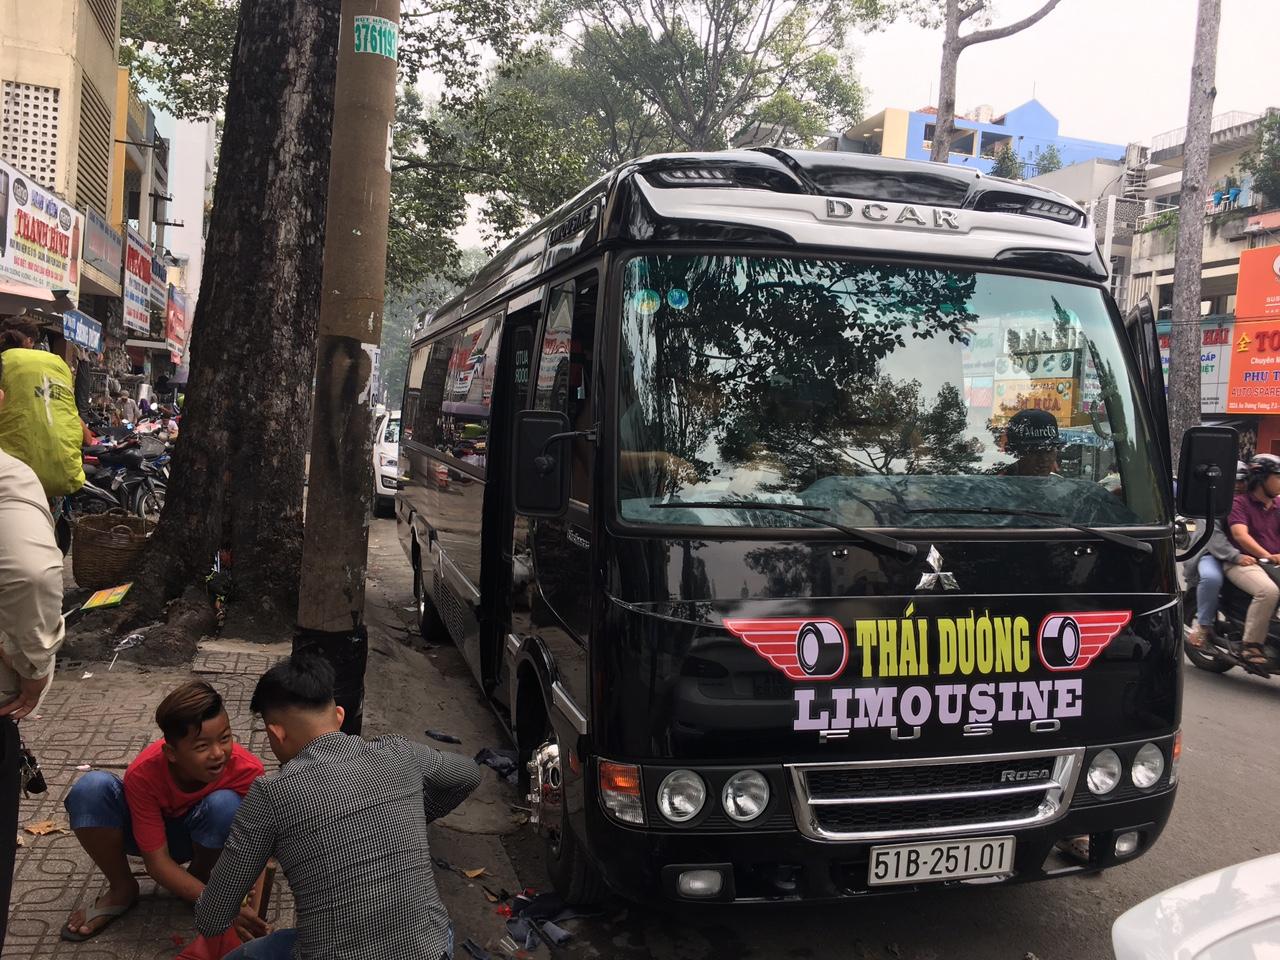 cf4890ad18d8f786aec9 1 - Thuê xe Fuso limousine 19 chỗ đi Campuchia